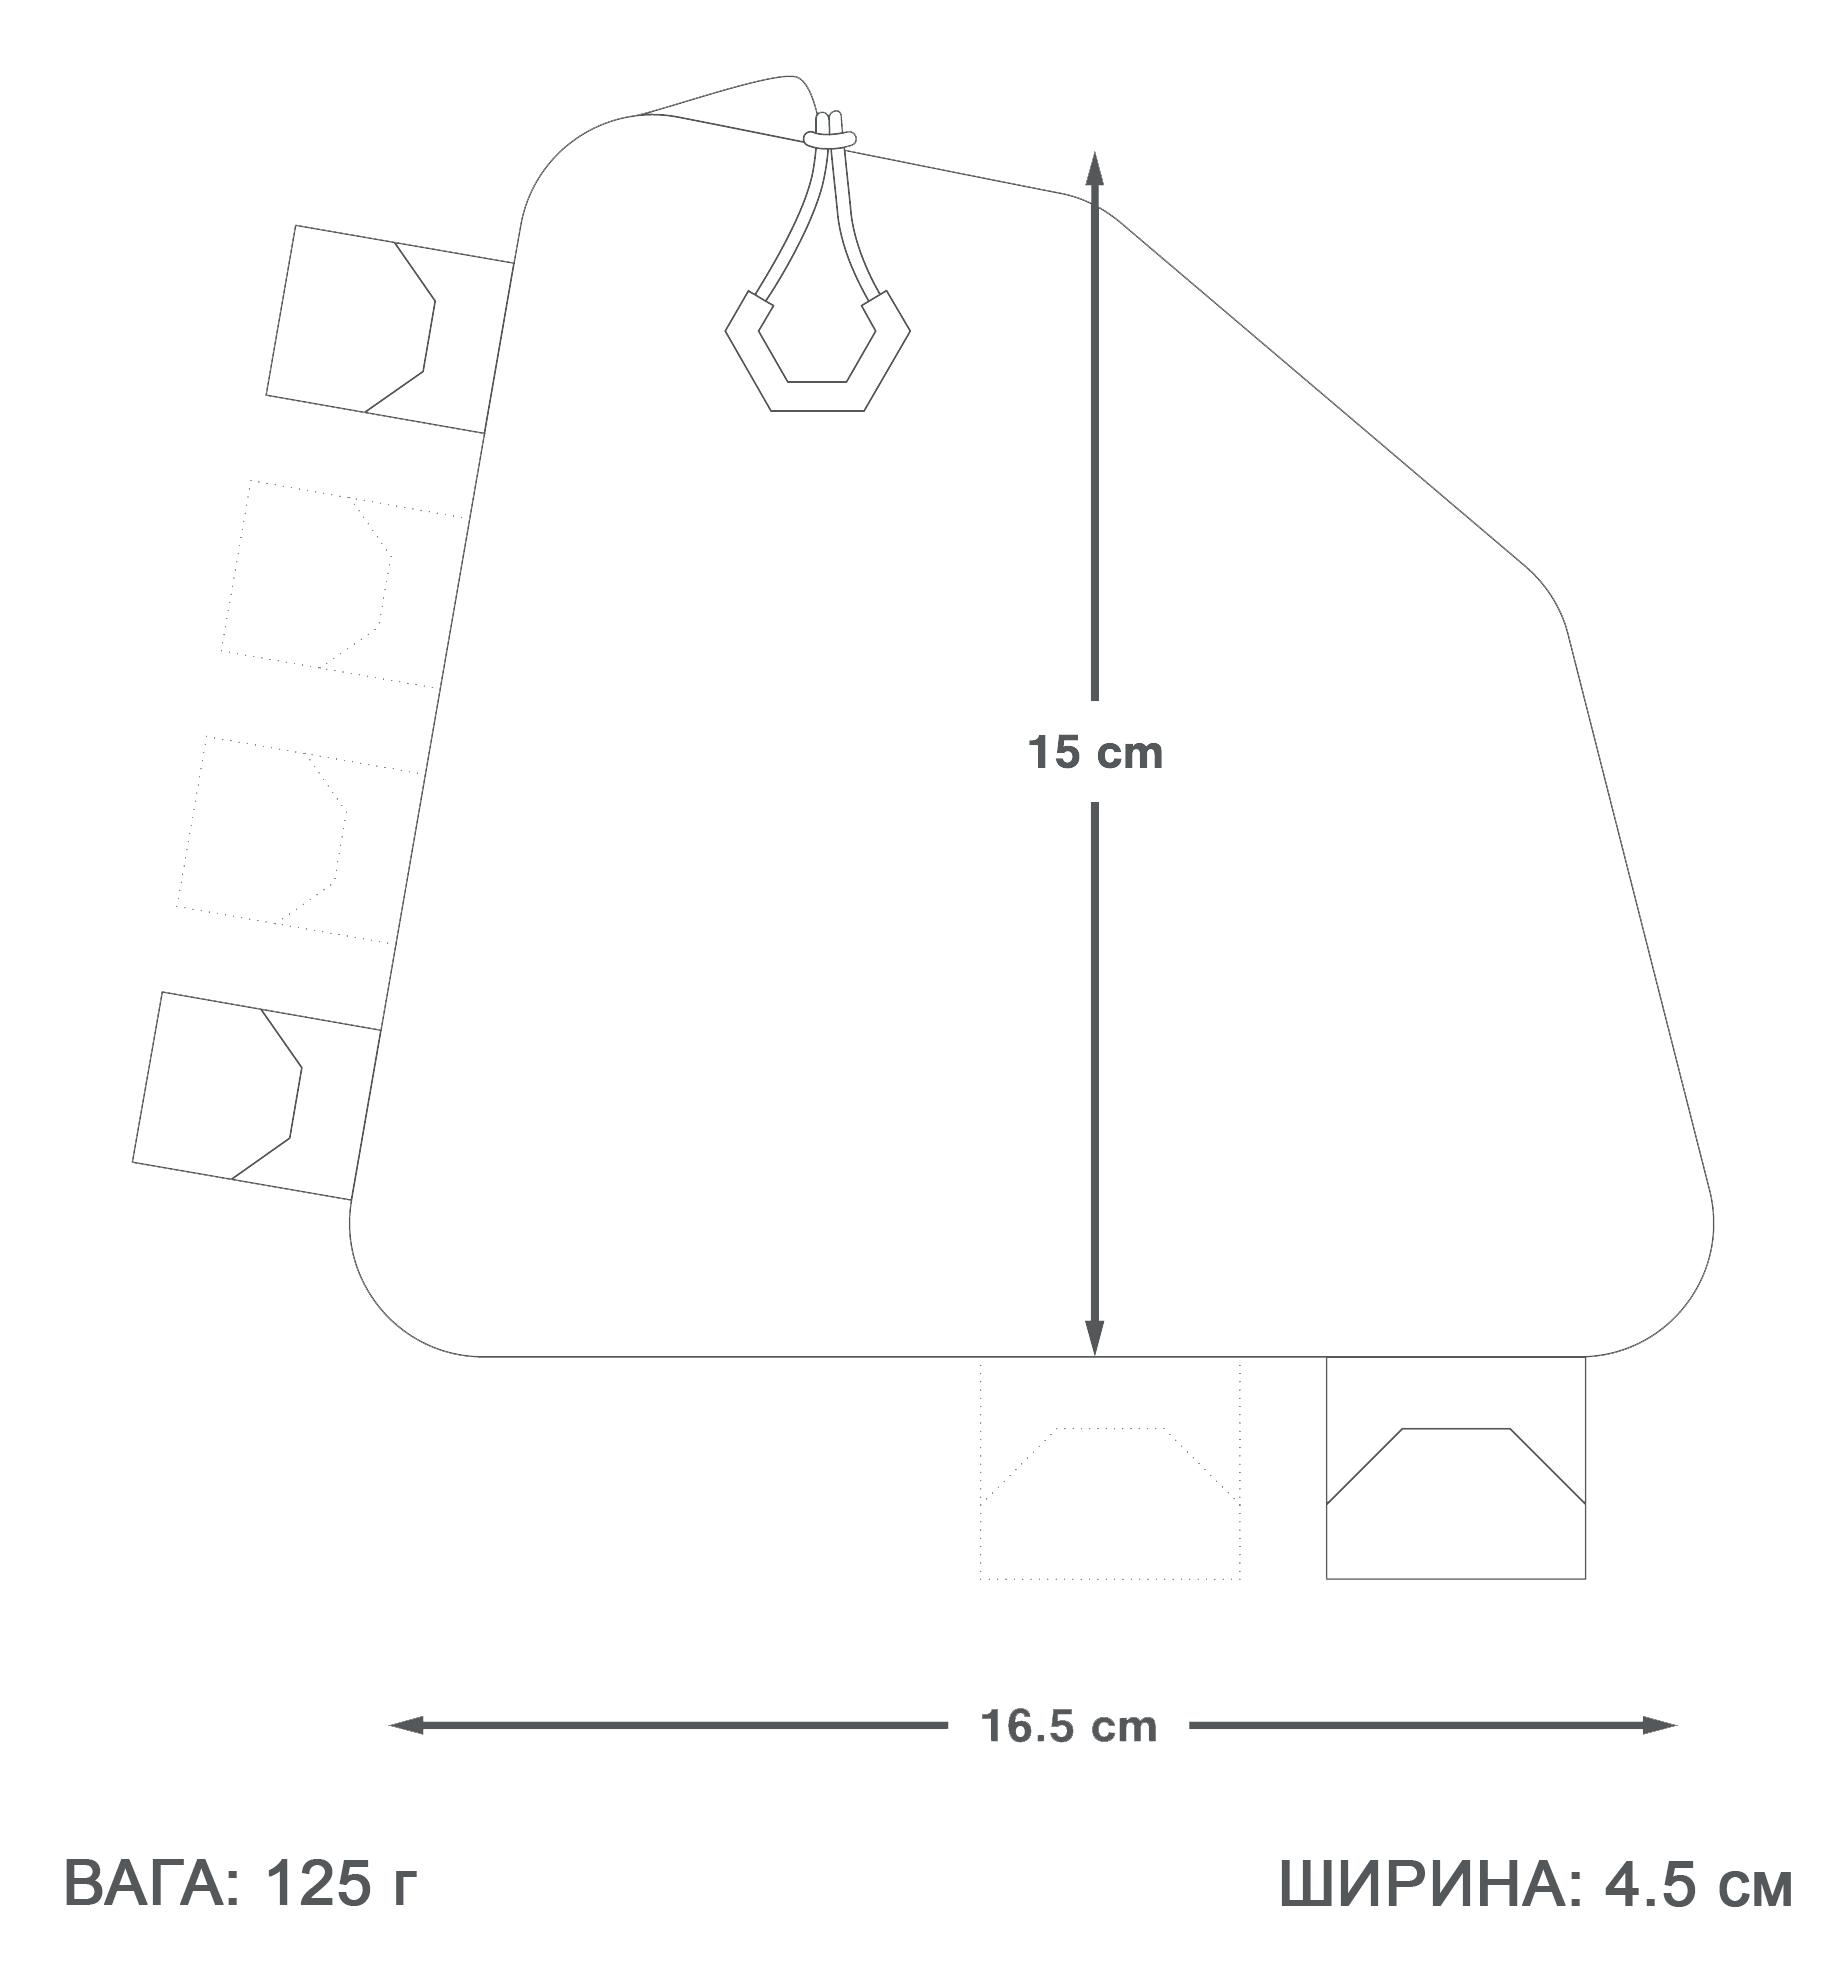 apidura-b-r-t-t-p-1l%20%D0%BA%D0%BE%D0%BF%D0%B8%D1%8F.jpg